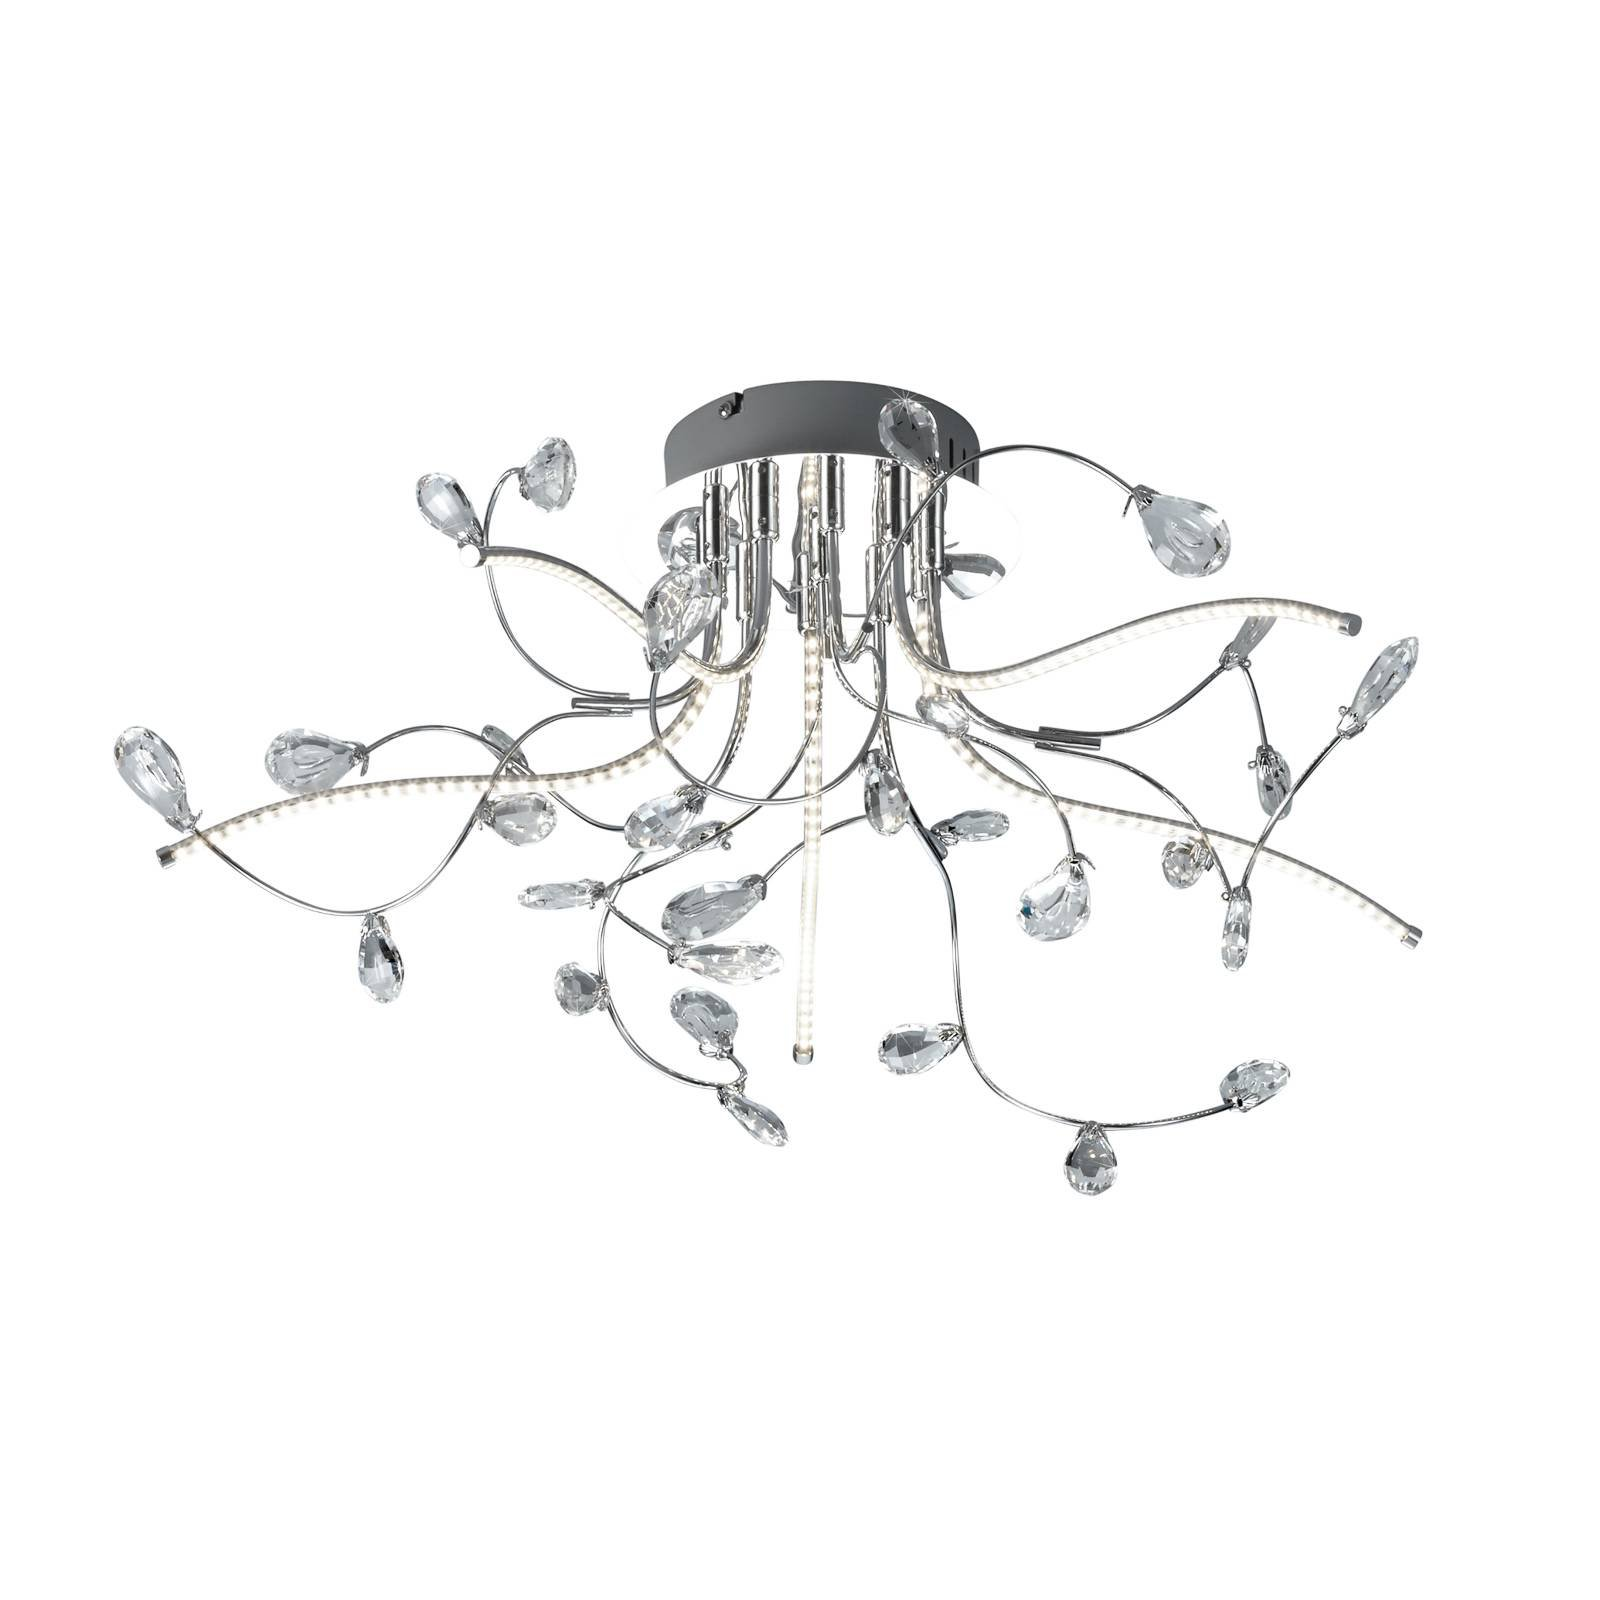 B-Leuchten Crystal taklampe, krom, 54 cm